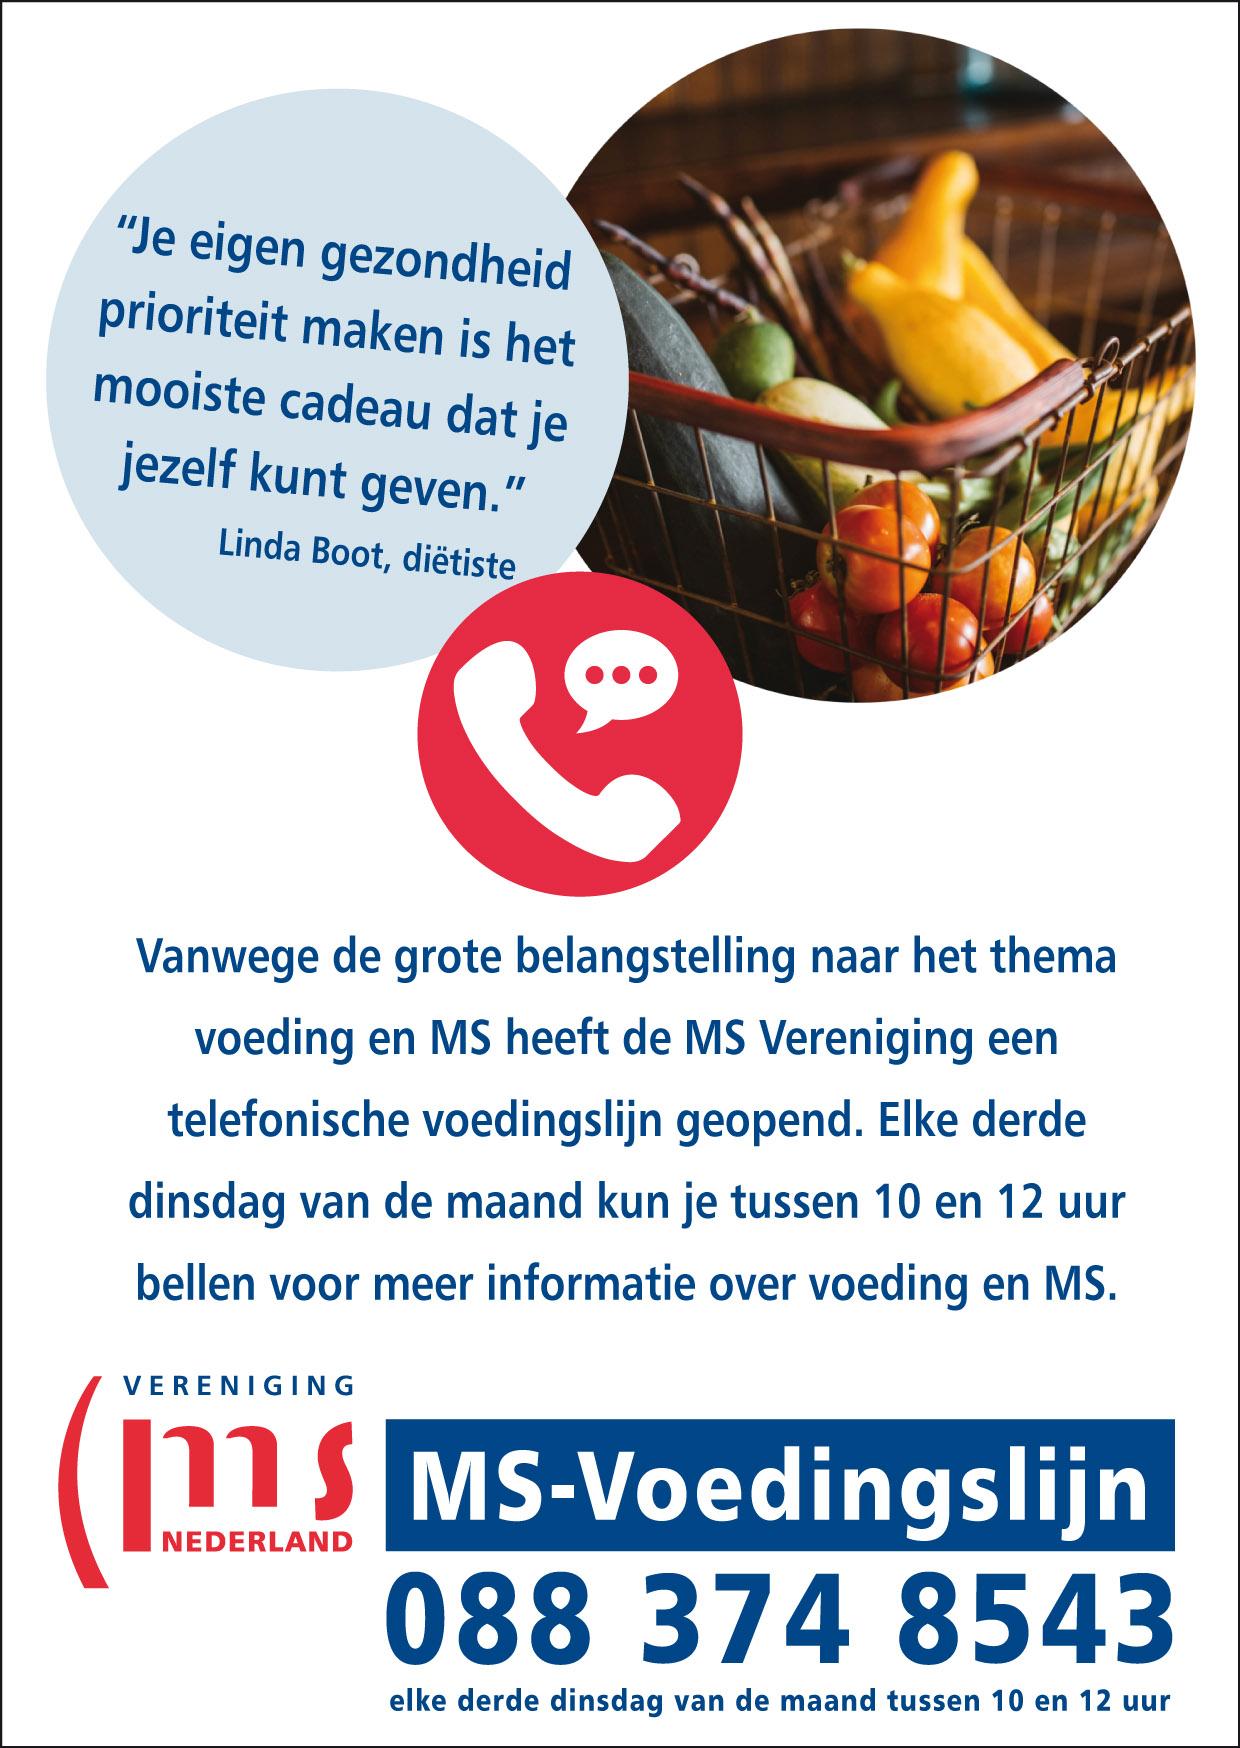 MS-voedingslijn MS Vereniging Nederland